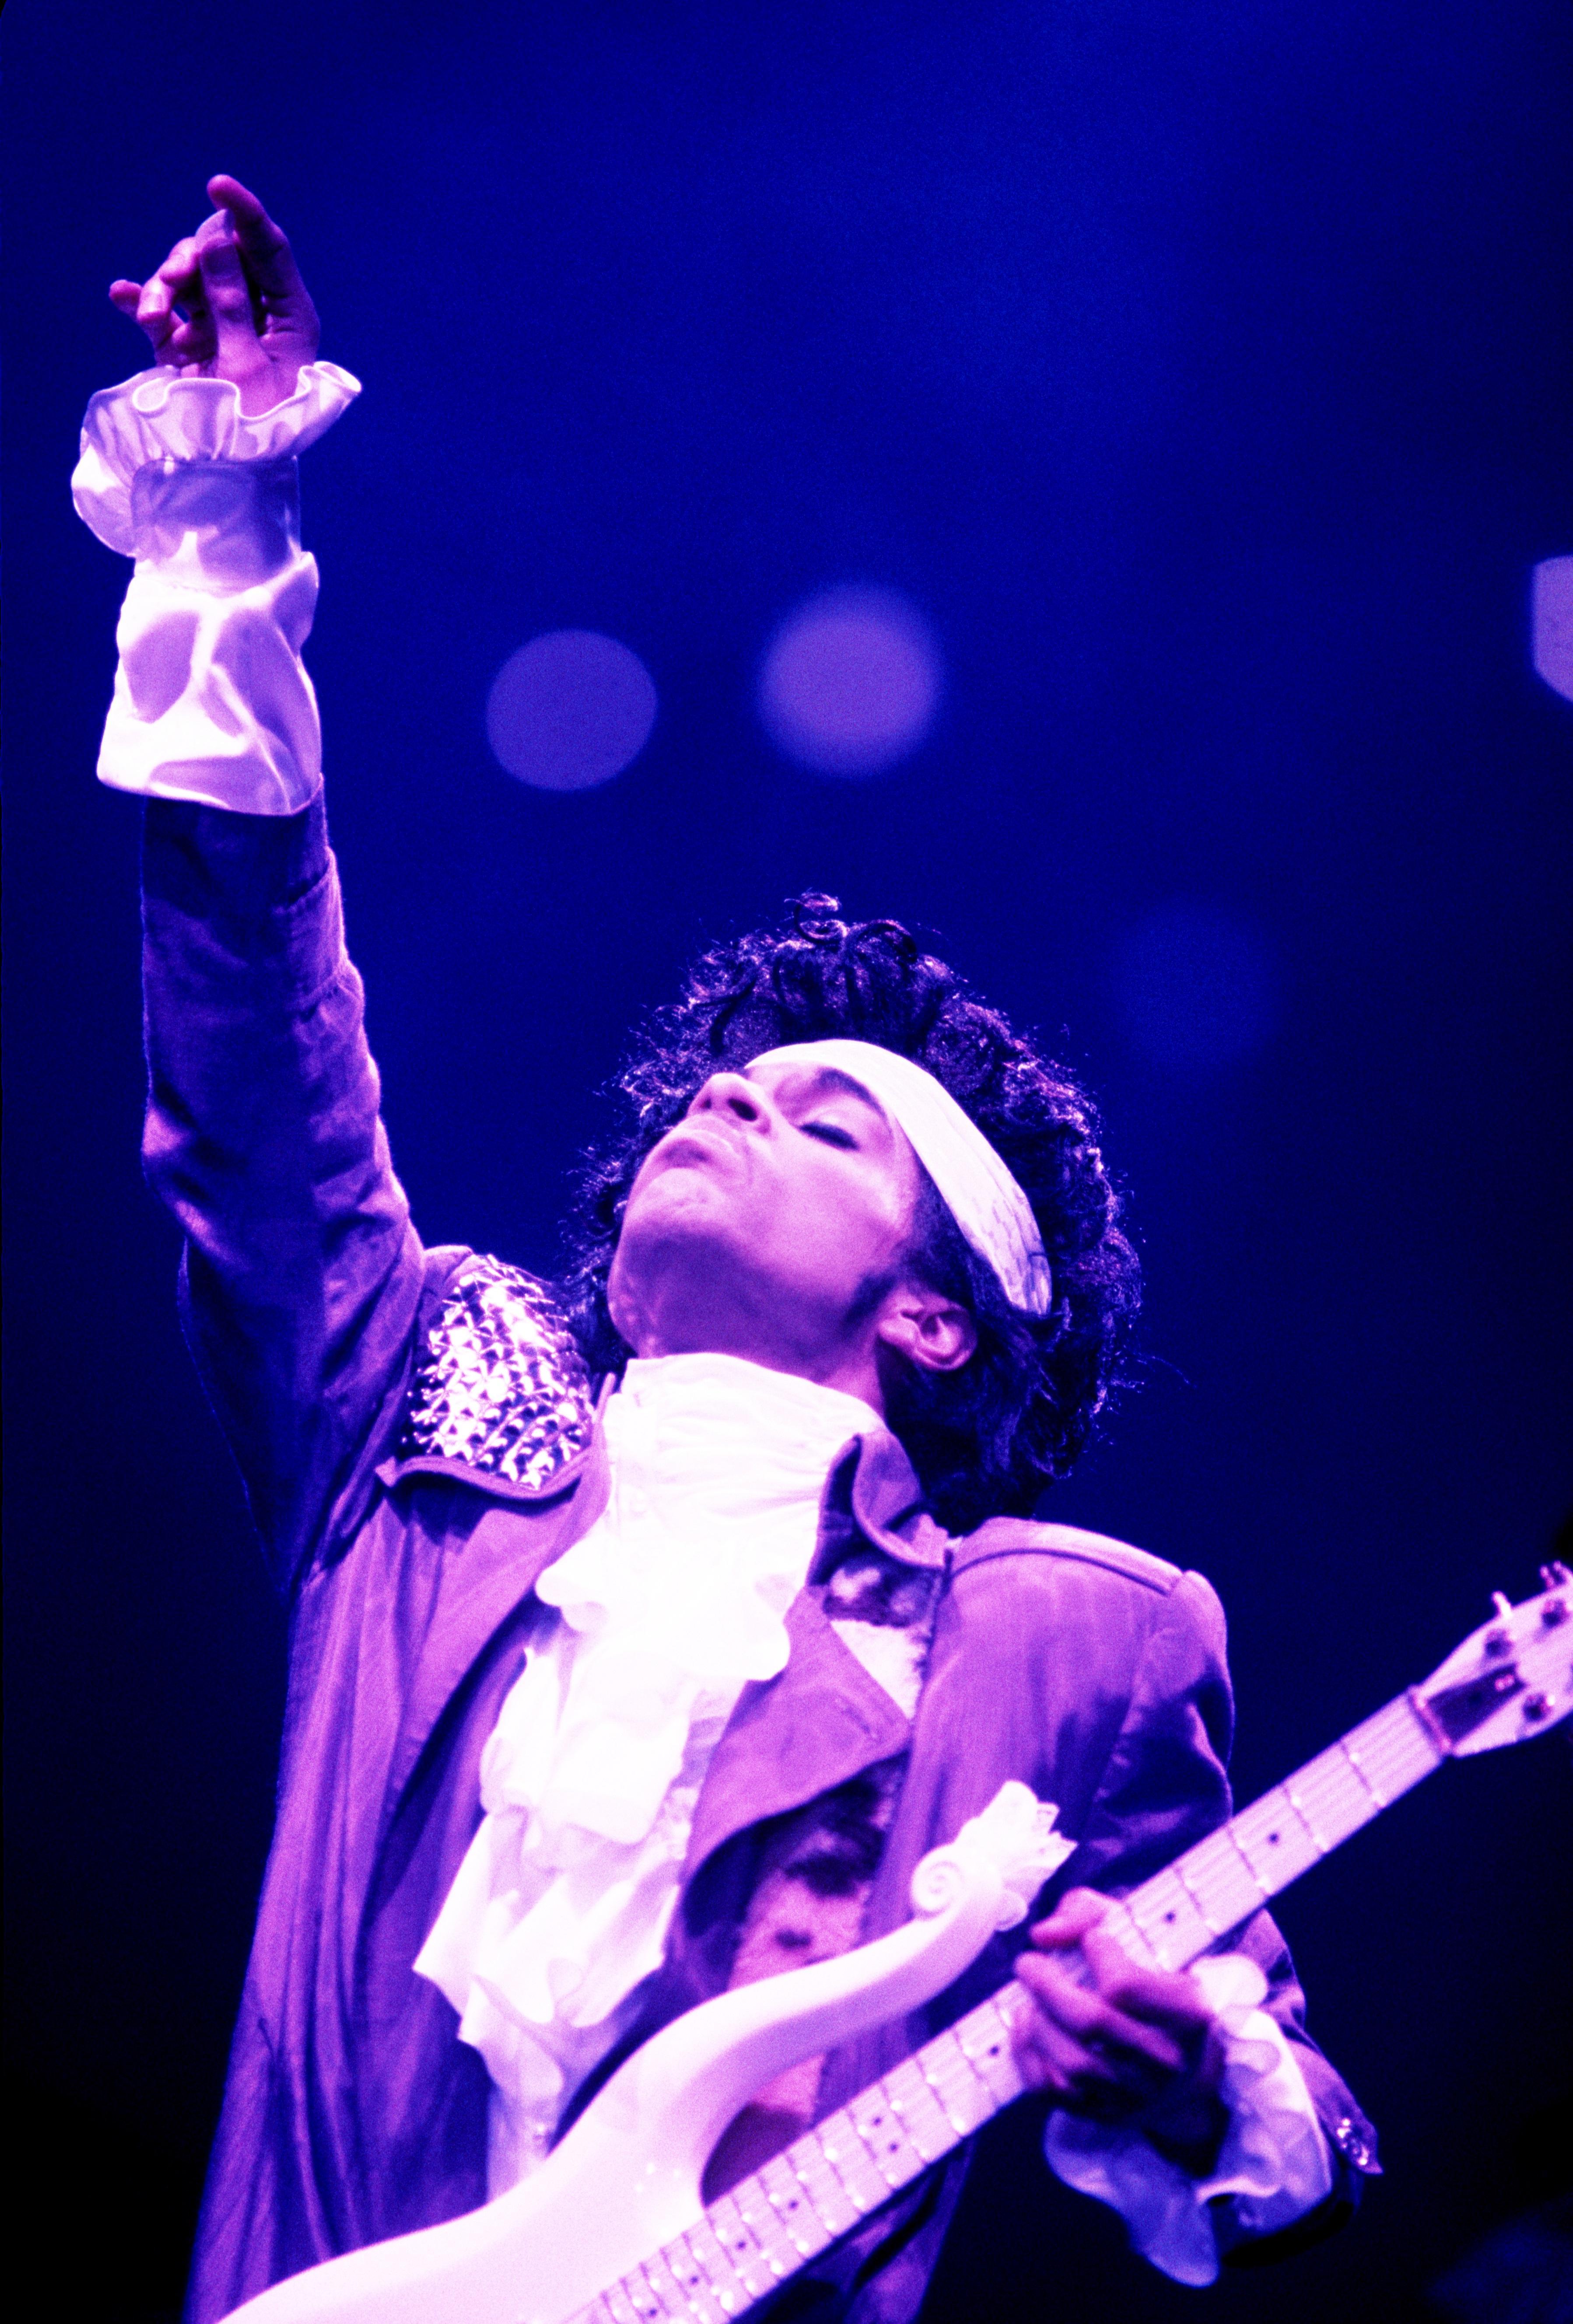 Prince and the Purple Rain Era Studio Sessions: 1983 and